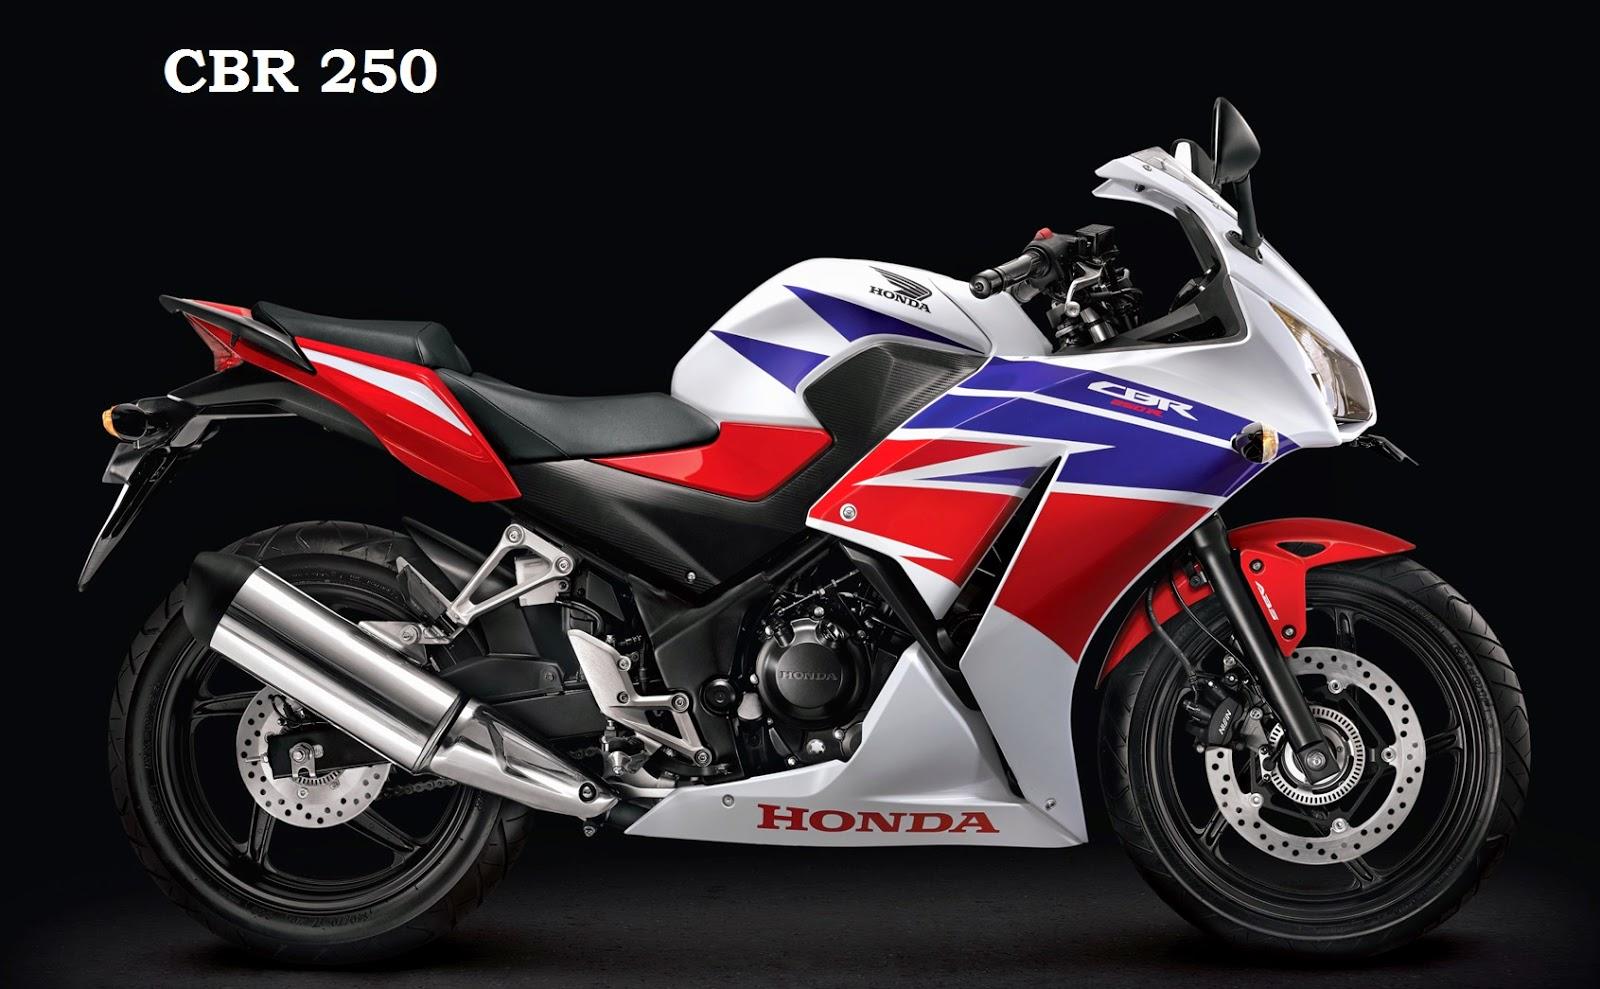 Daftar Harga Resmi Motor Honda Lengkap Bulan November 2018 Bengkel